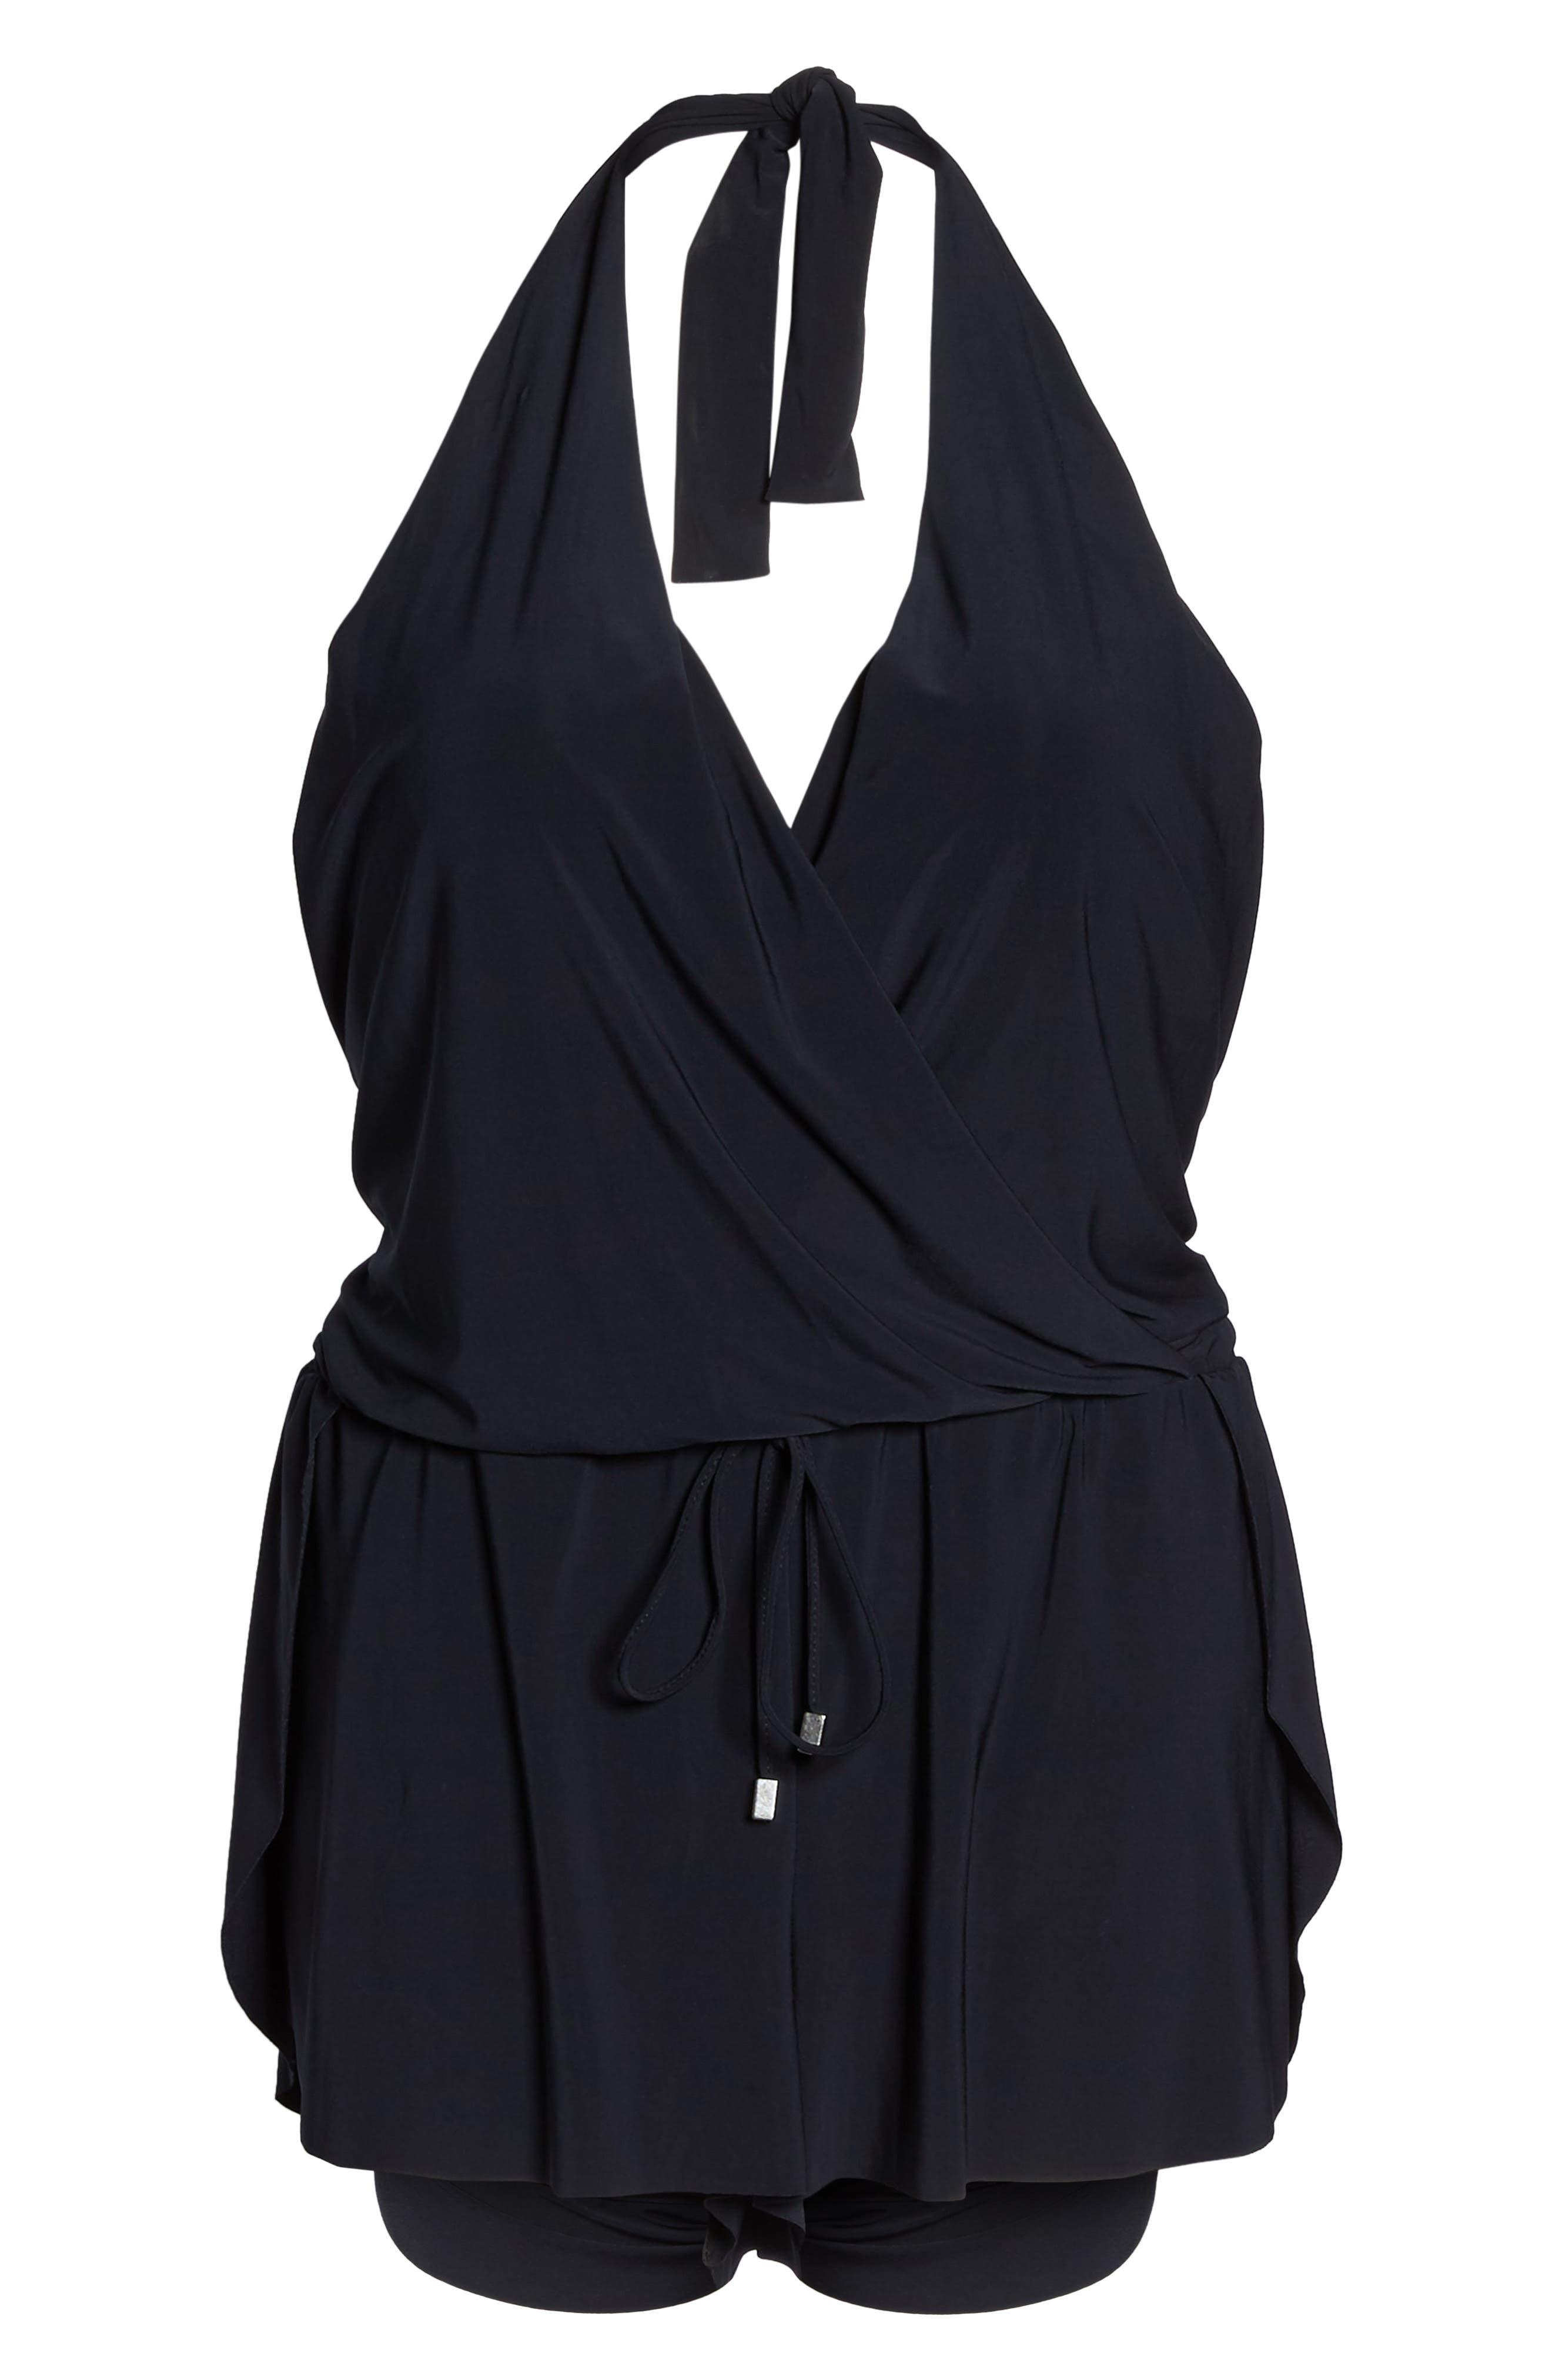 Bianca One-Piece Romper Swimsuit,                             Alternate thumbnail 6, color,                             Black